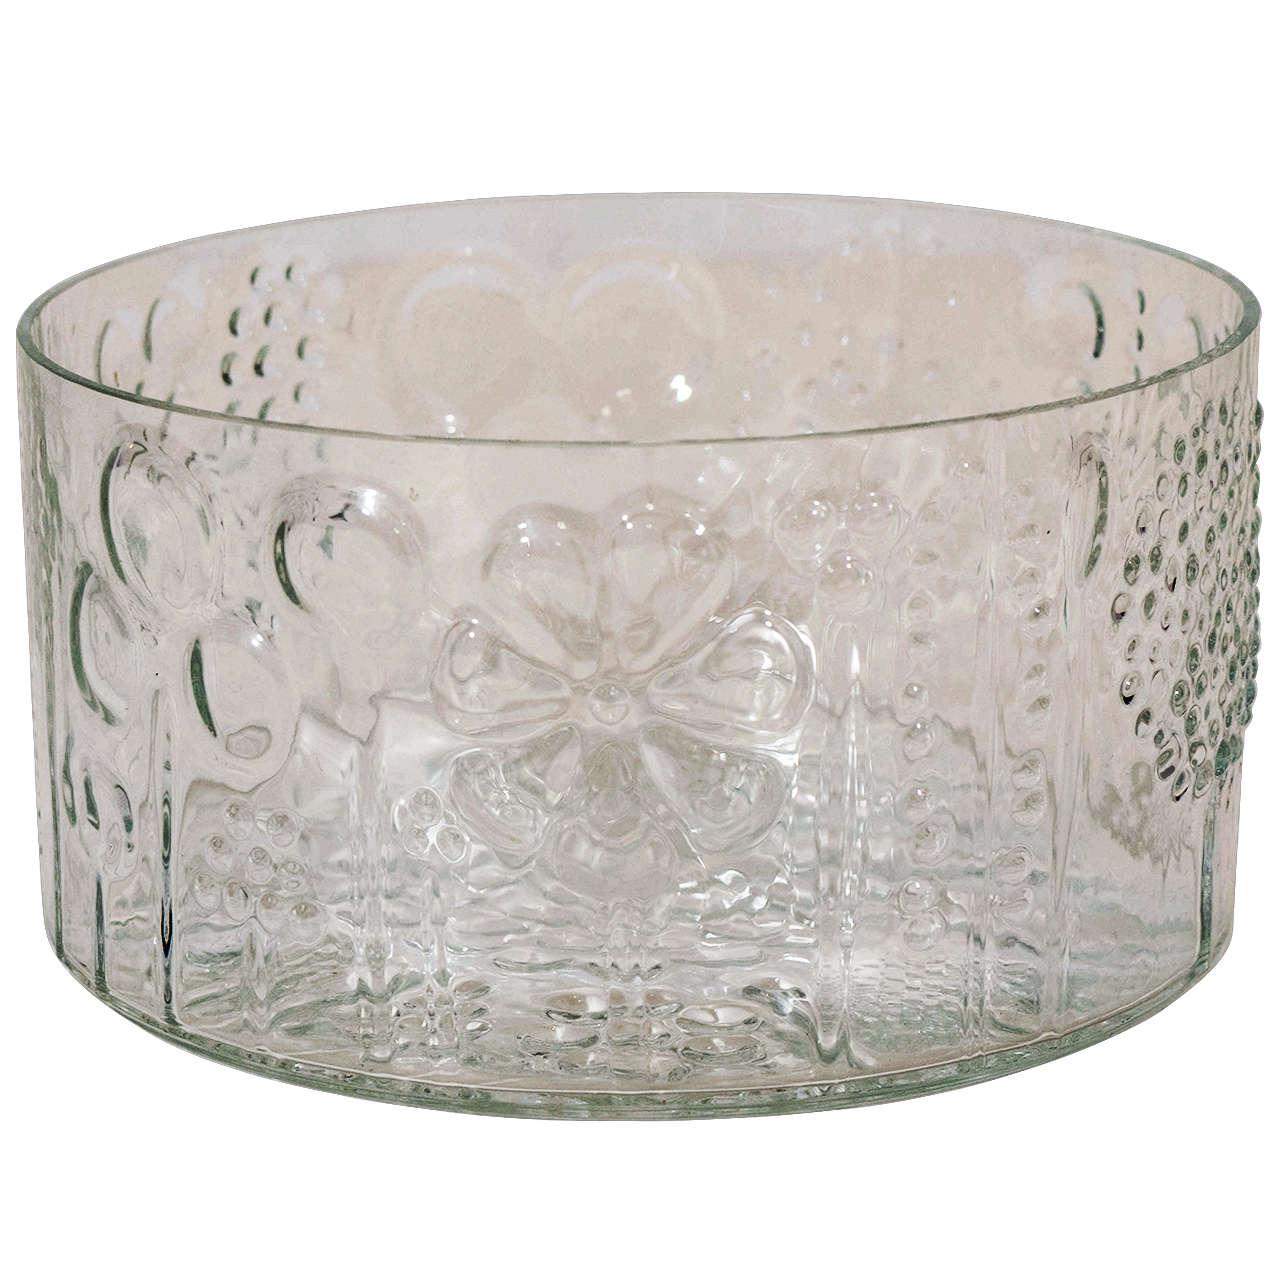 Art Glass Bowl by Oiva Toikka for Iittala Finland